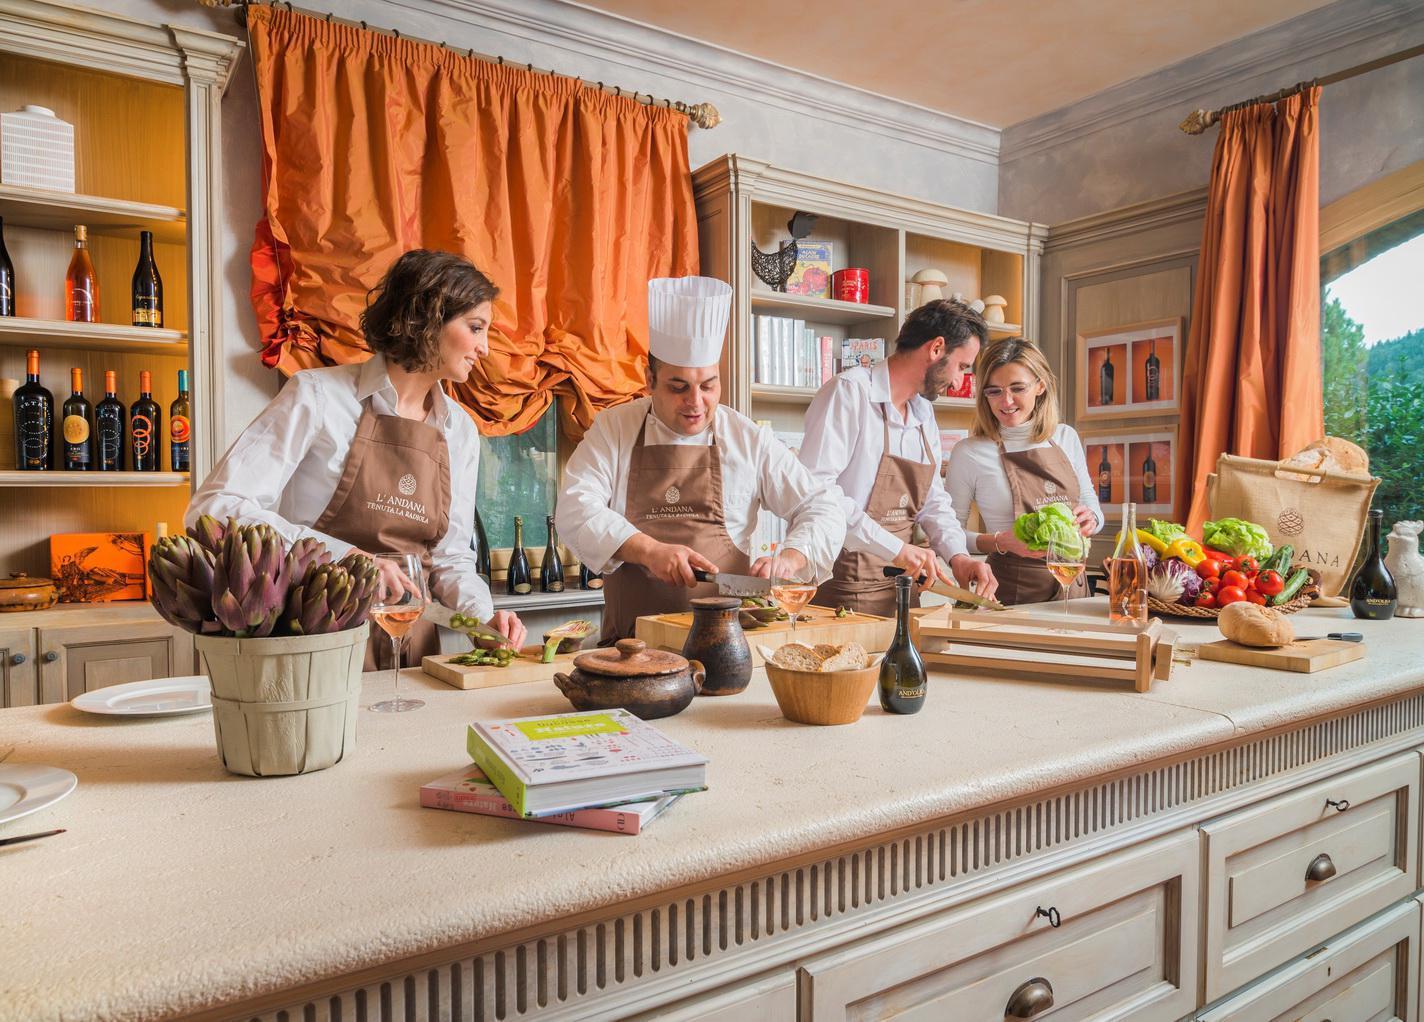 Chef por un día, Hoteles con cursos de Cocina